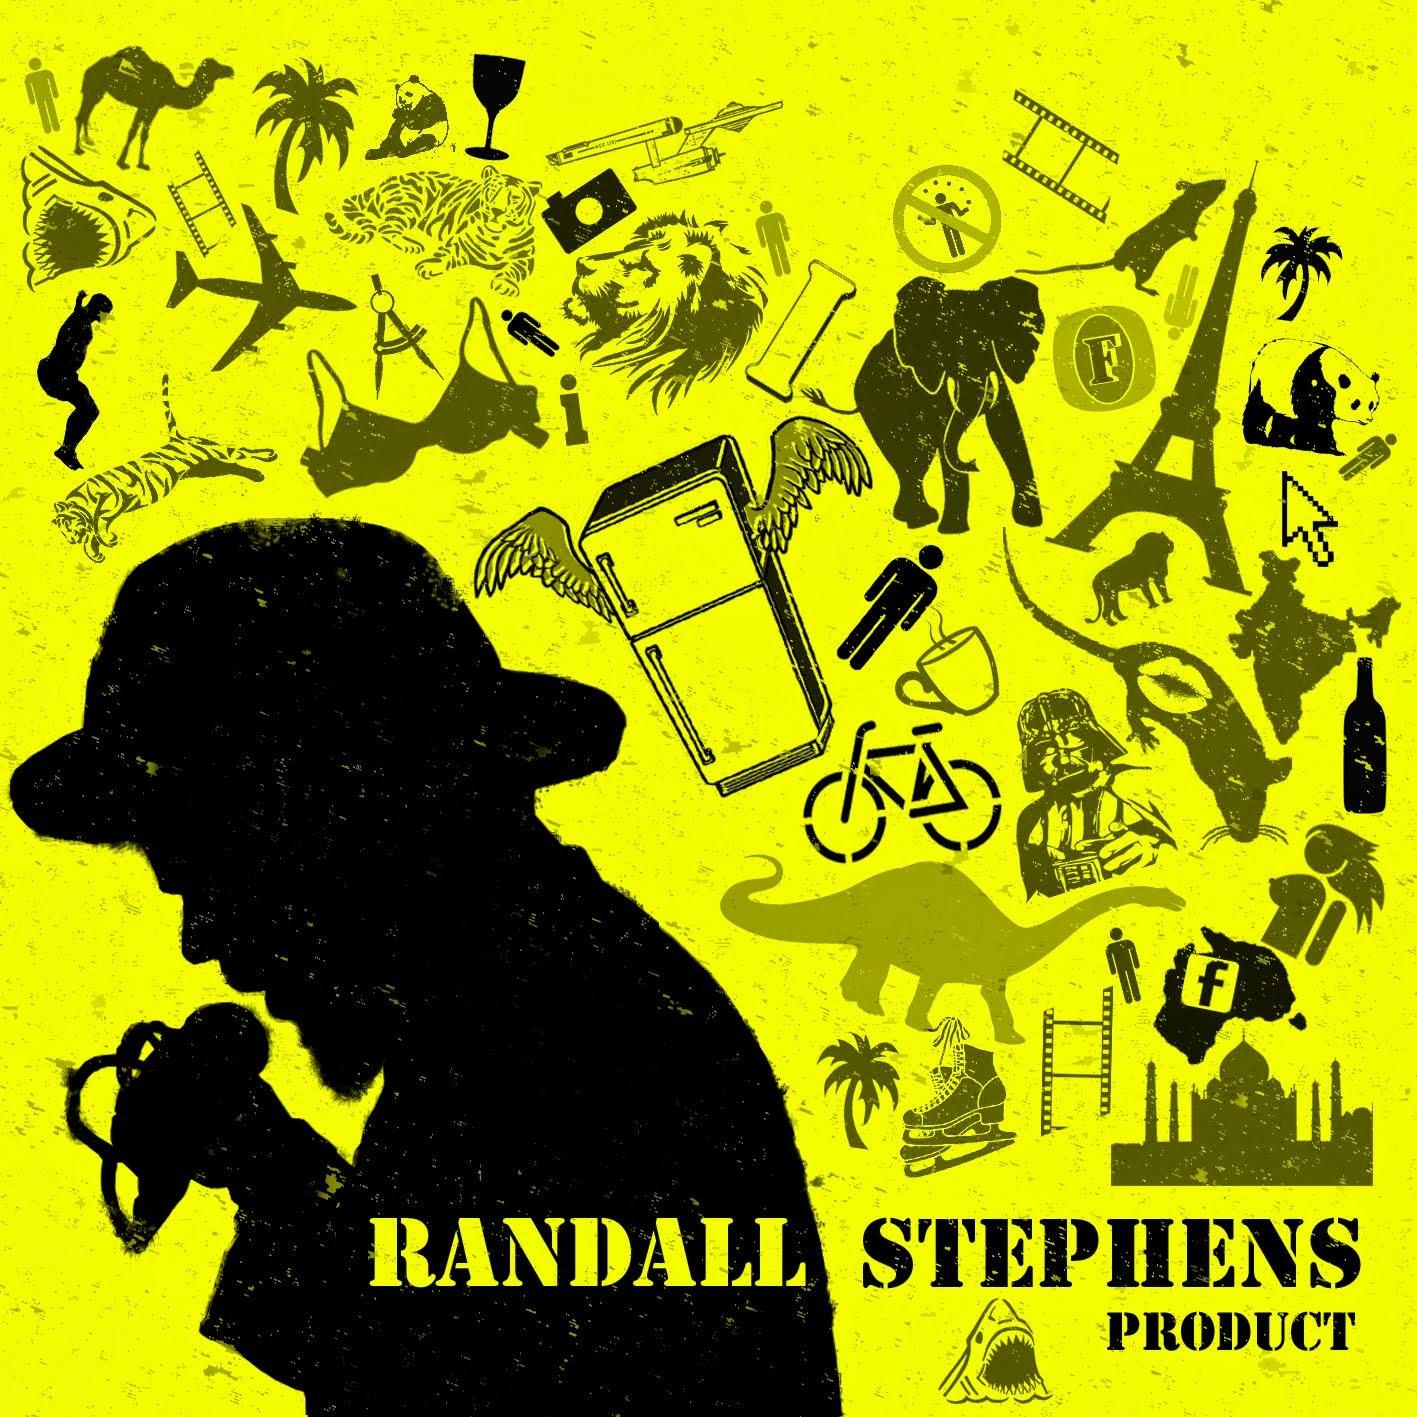 Randall Stephens -PRODUCT